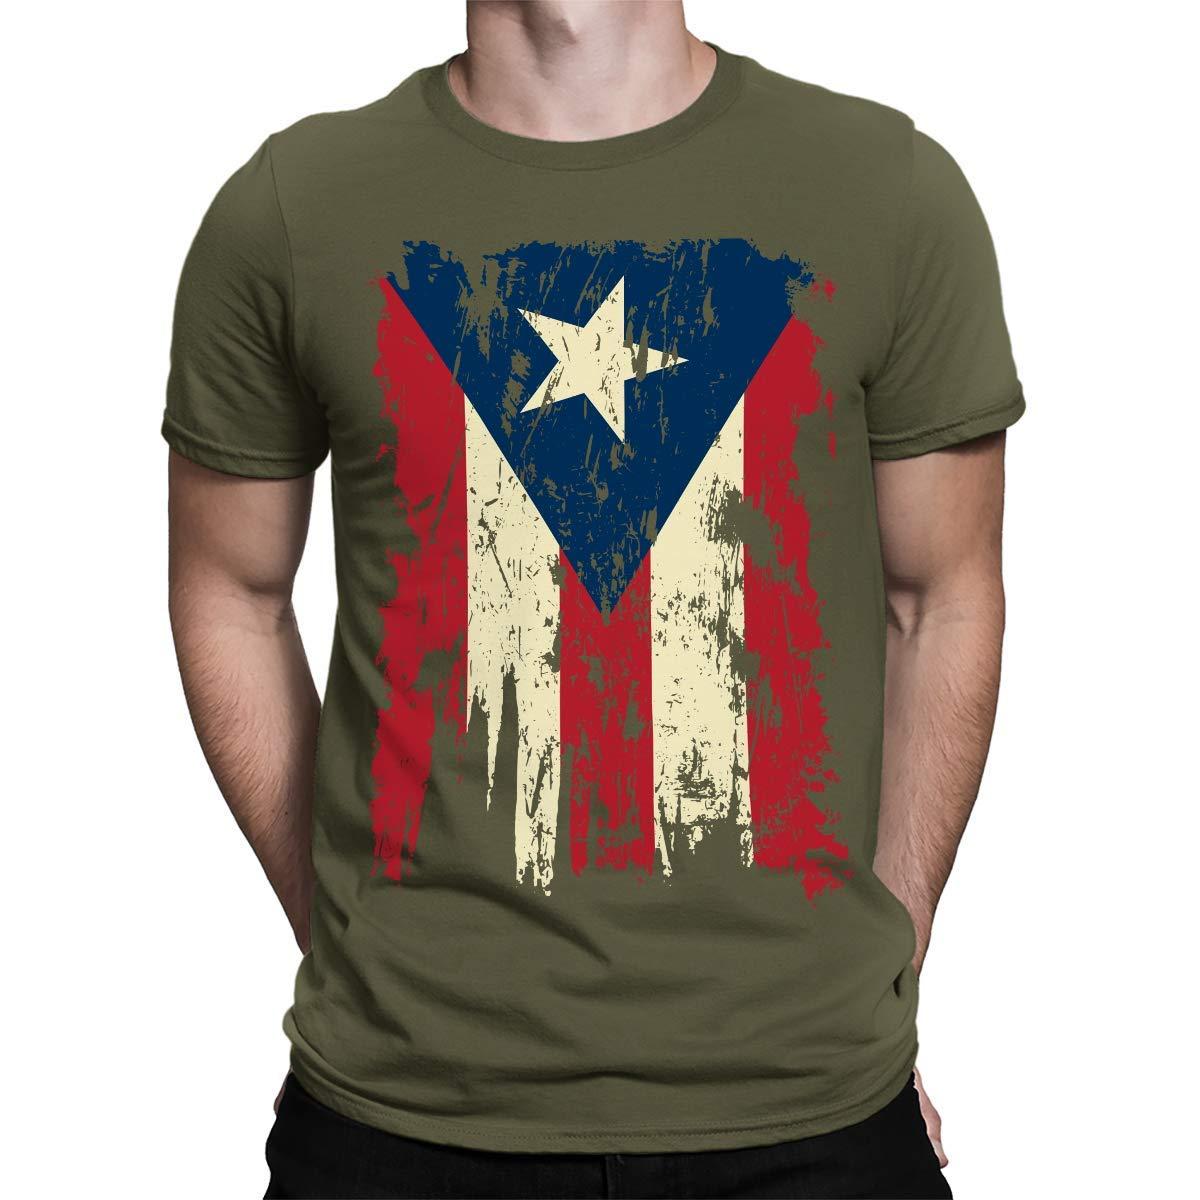 Kilsd Vintage Distressed Puerto Rico Mens T-Shirt